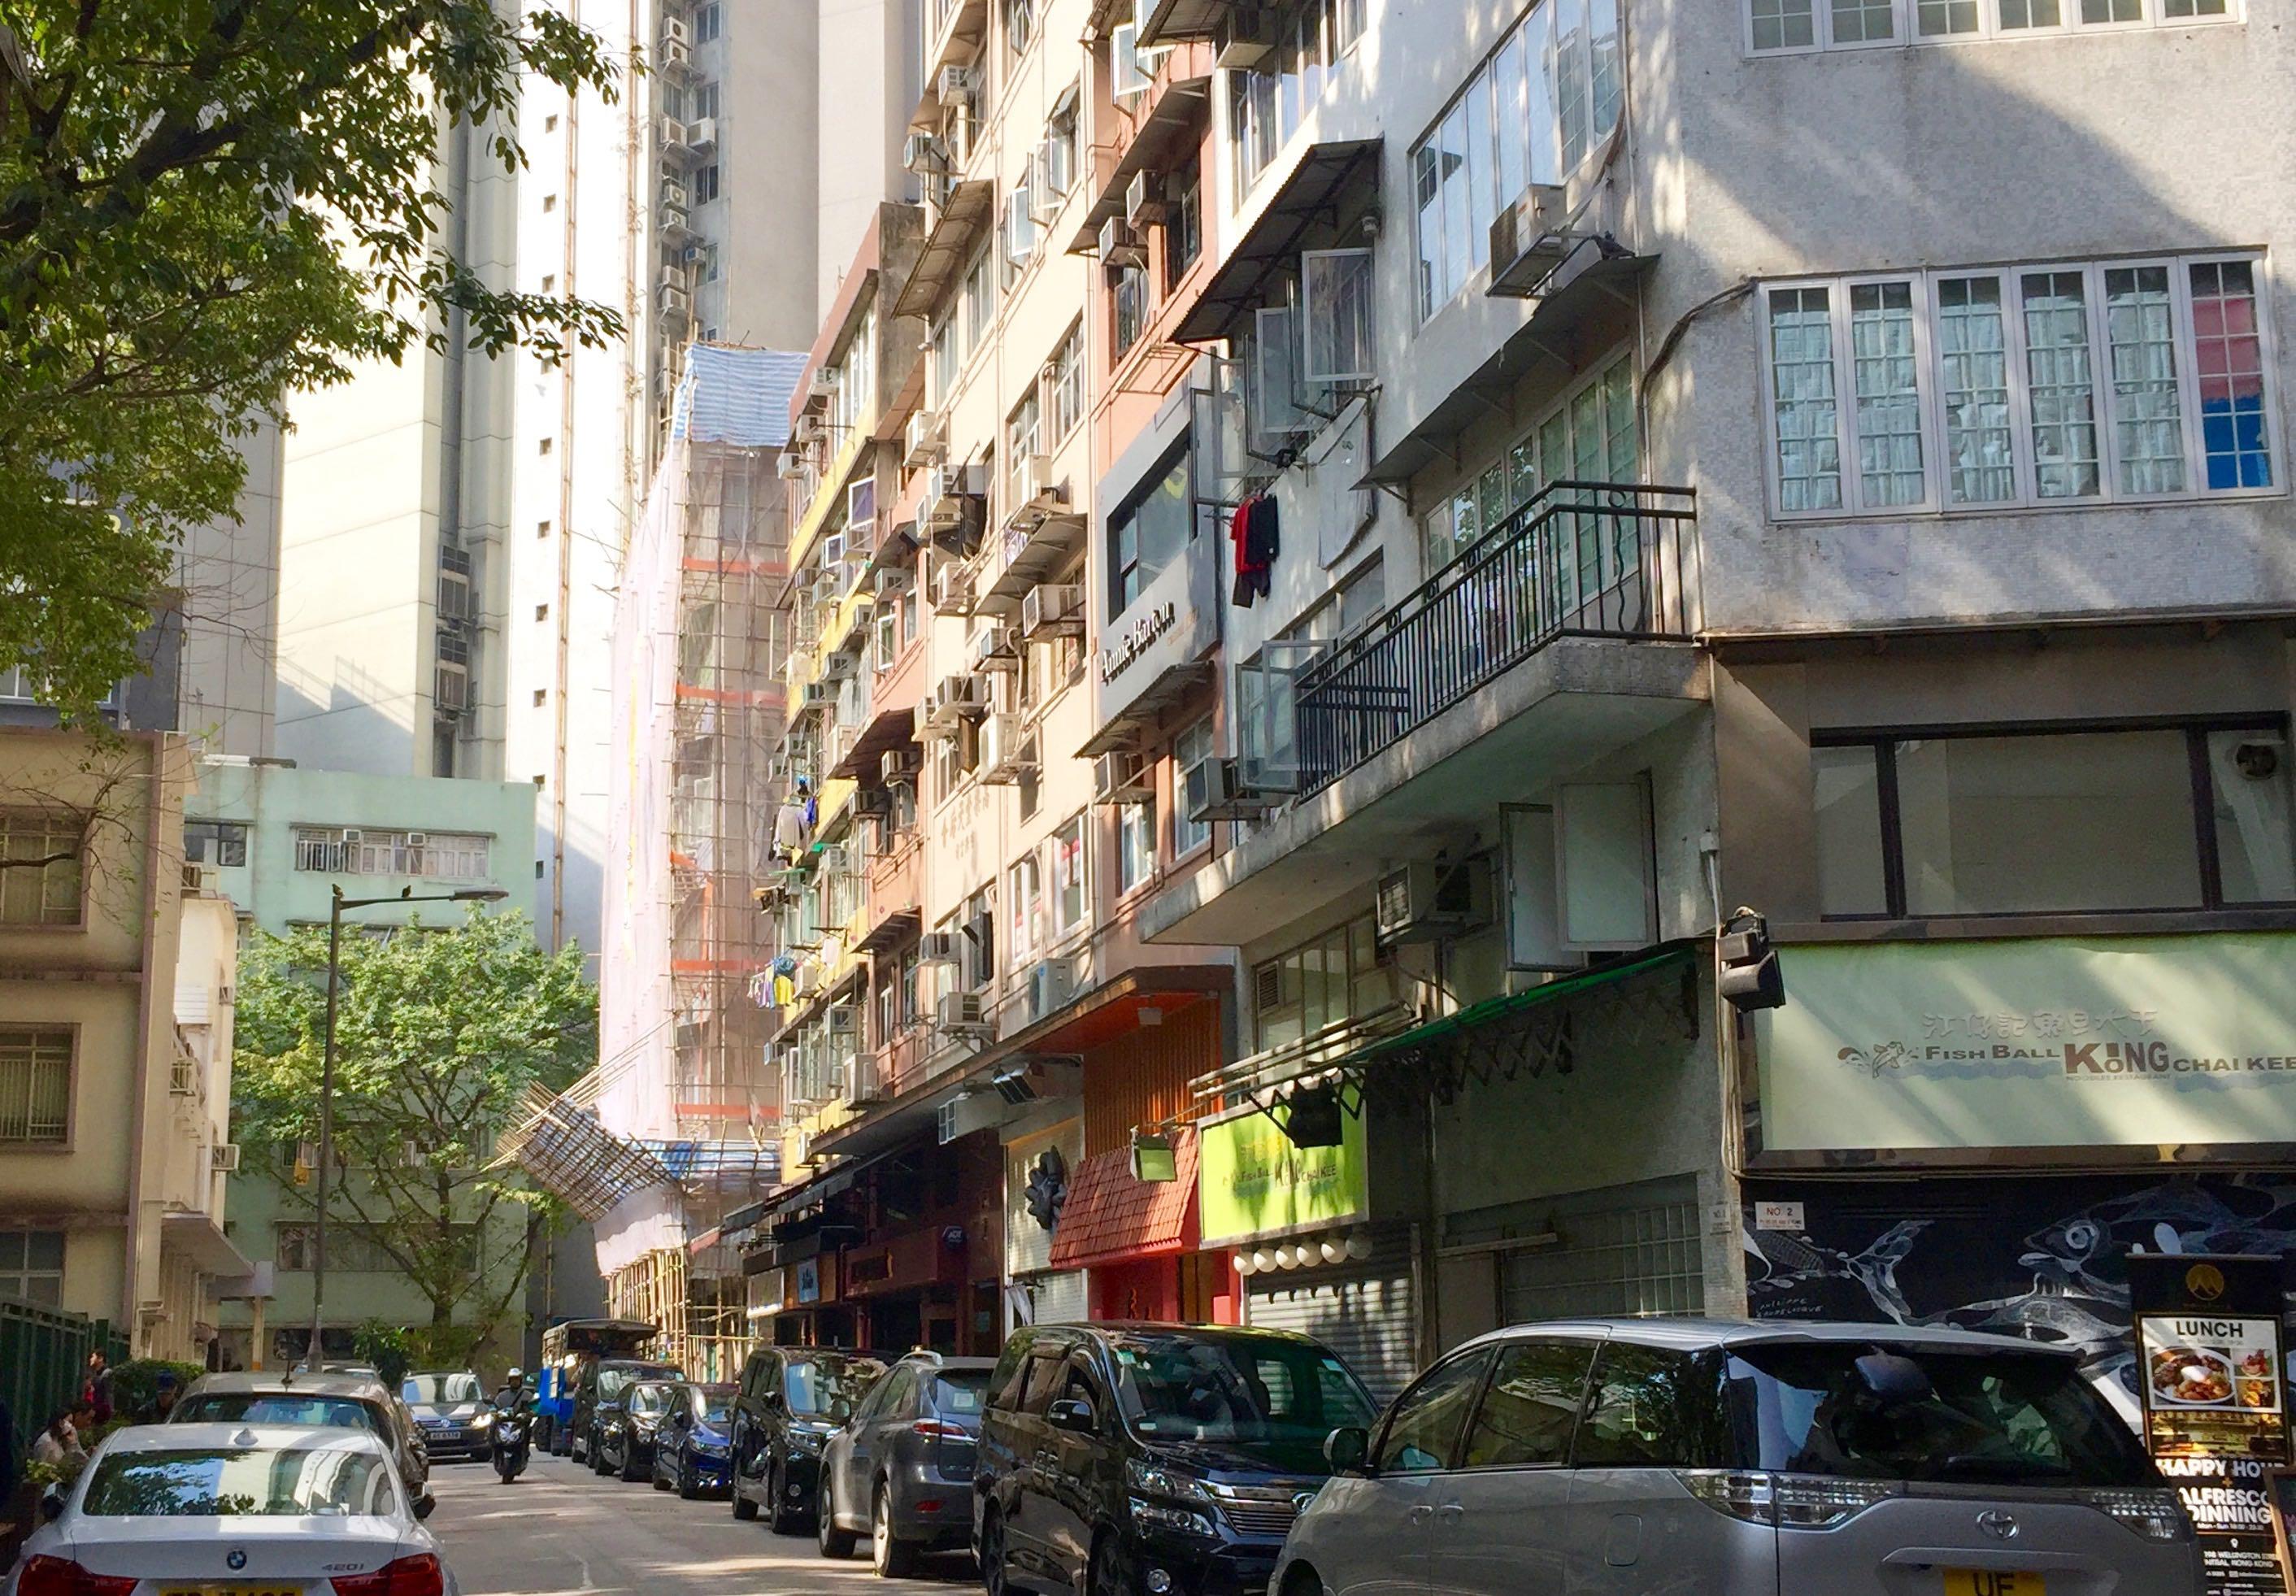 Central Kau U Fong - with neighbourhood restaurant vibes next to Gough Street